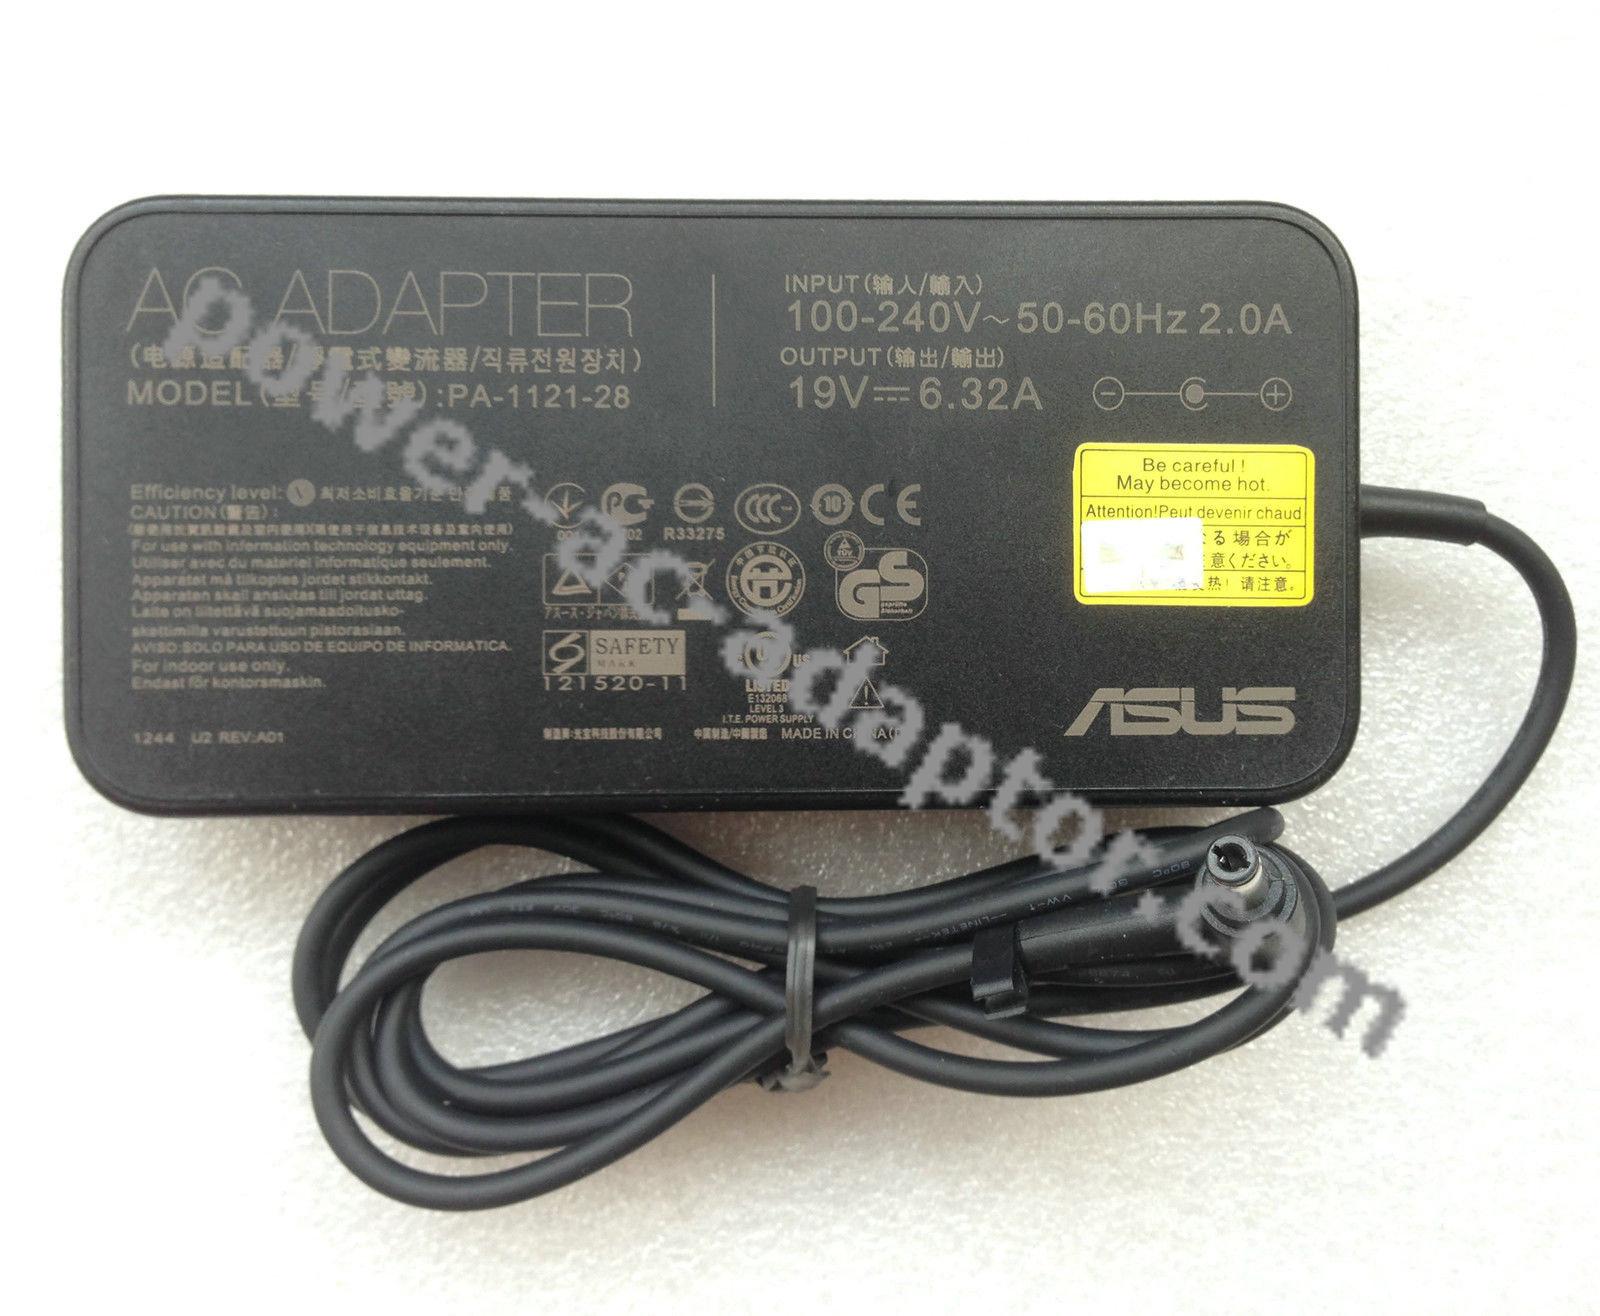 Original OEM ASUS 120W 19V 6.32 AC Adapter Charger ADP-120ZB BB PA-1121-28